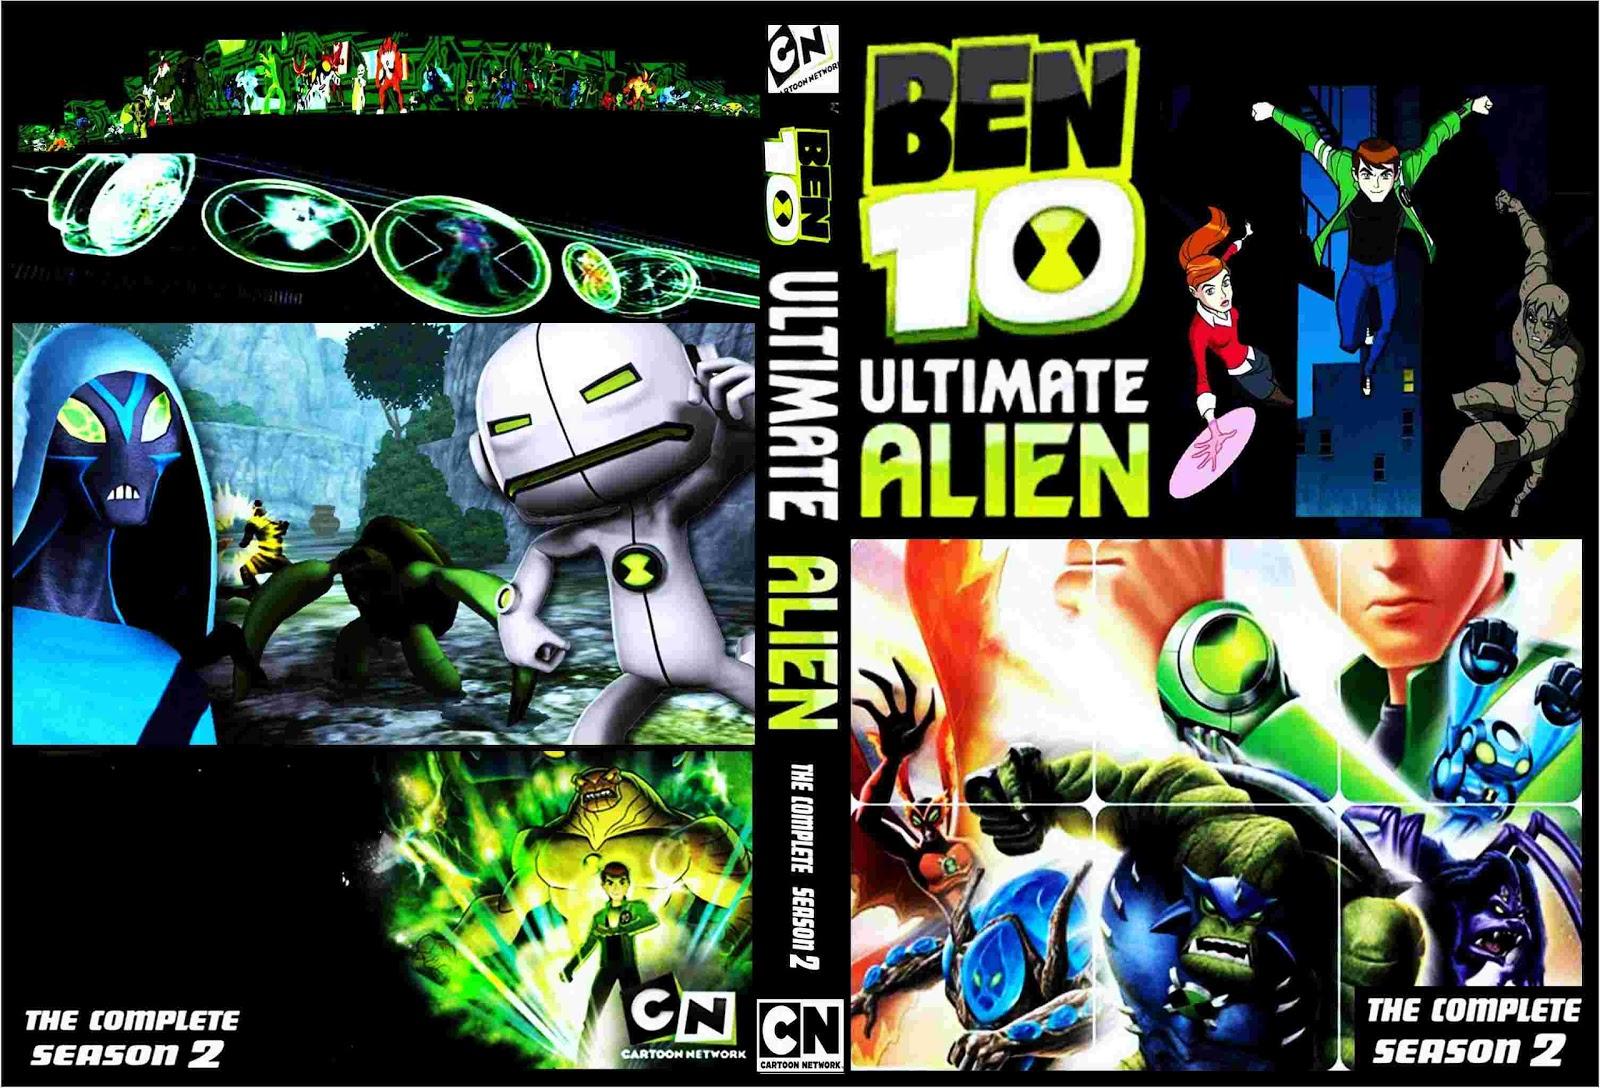 Ben 10 ultimate alien season 20 / Wild orchid movie love scenes